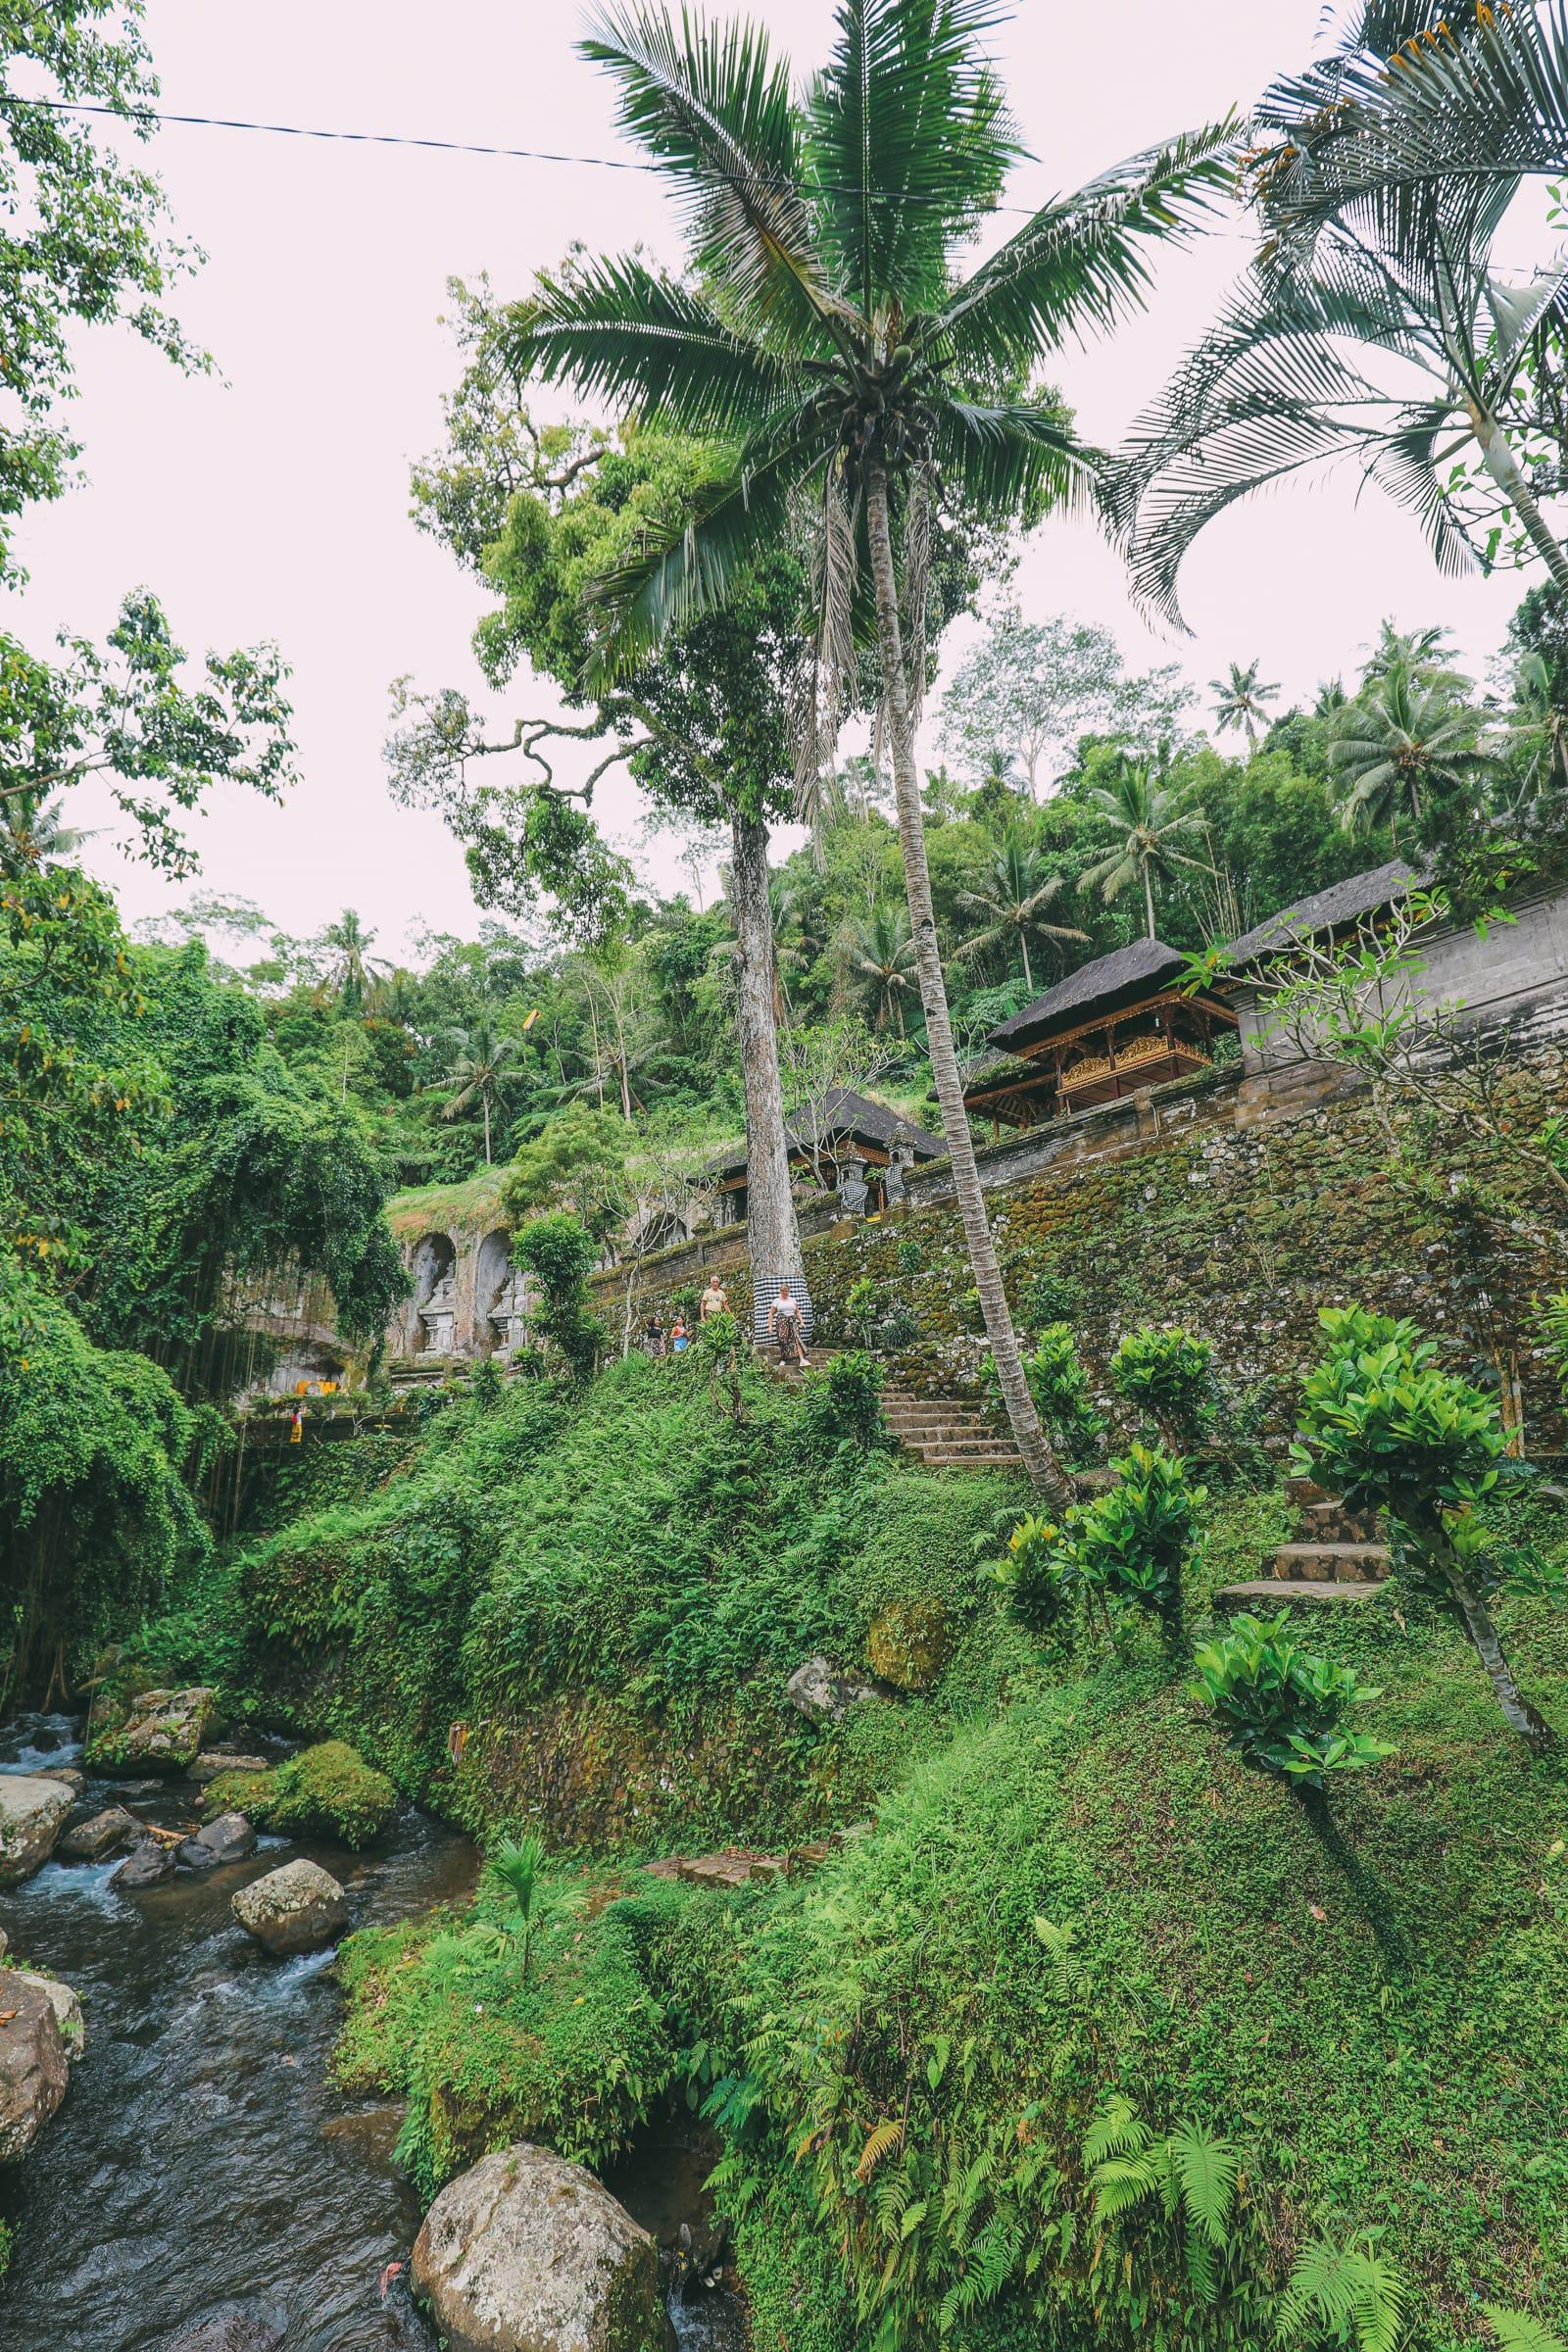 Bali Travel - Tegalalang Rice Terrace In Ubud And Gunung Kawi Temple (30)